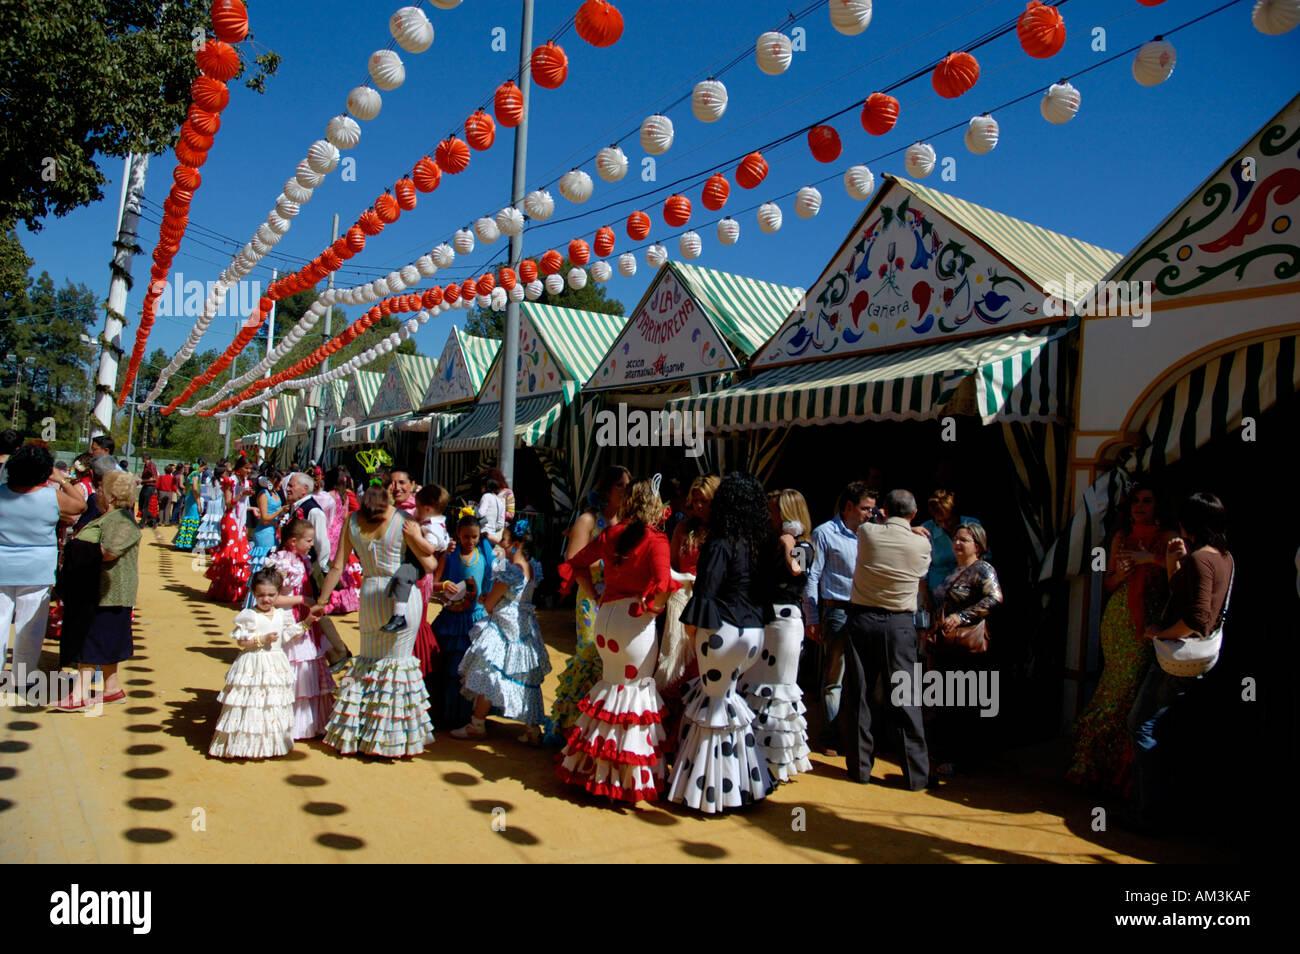 La Feria! – A 2018 Guide to Spain's Best Festival